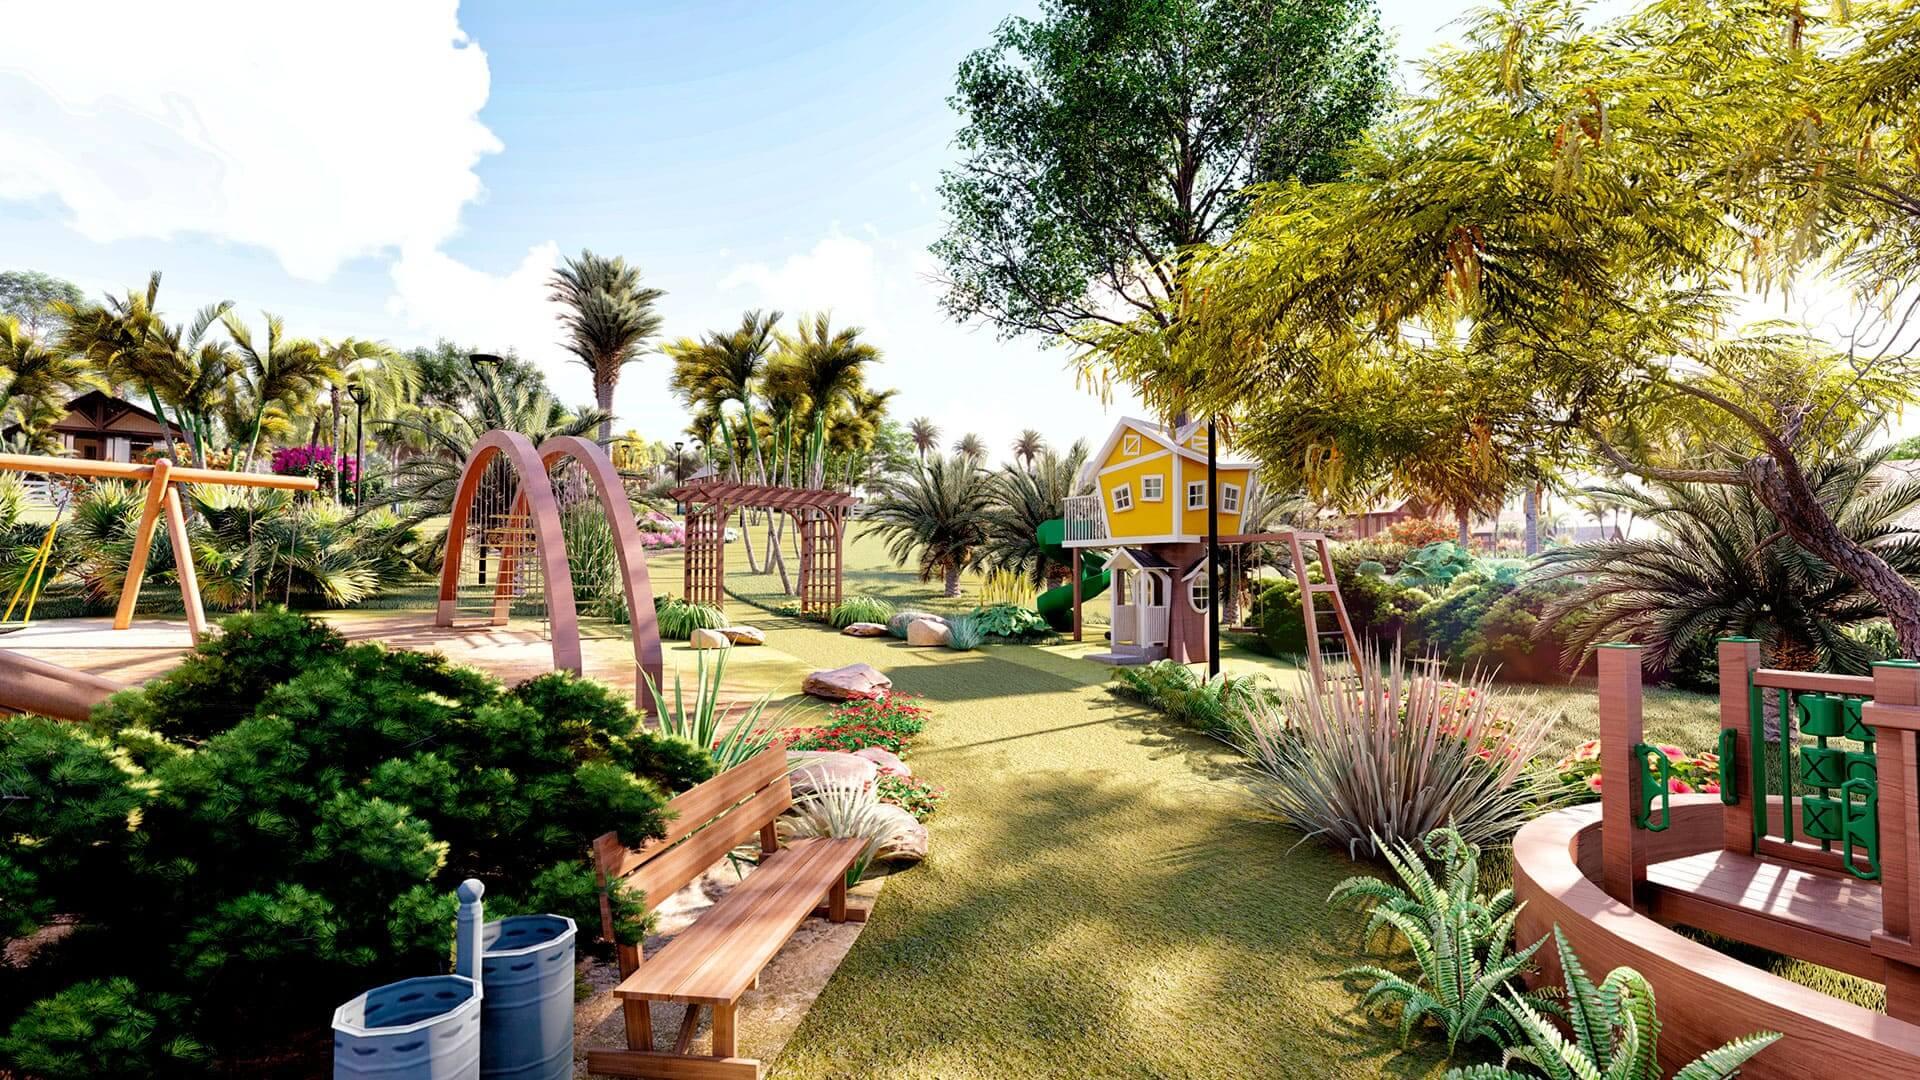 zonas recreativas para niños en Yanashpa Village, Tarapoto